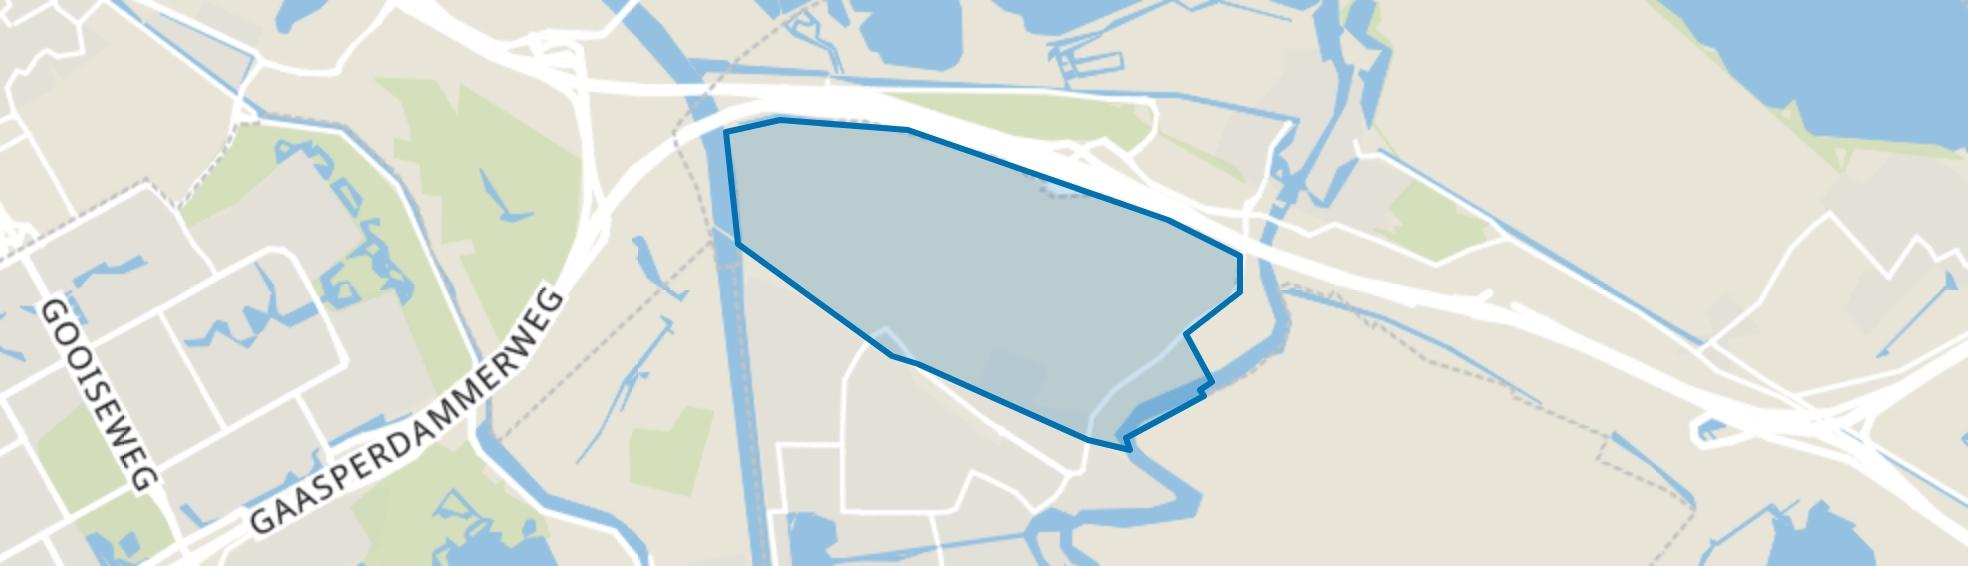 Weespersluis, Weesp map